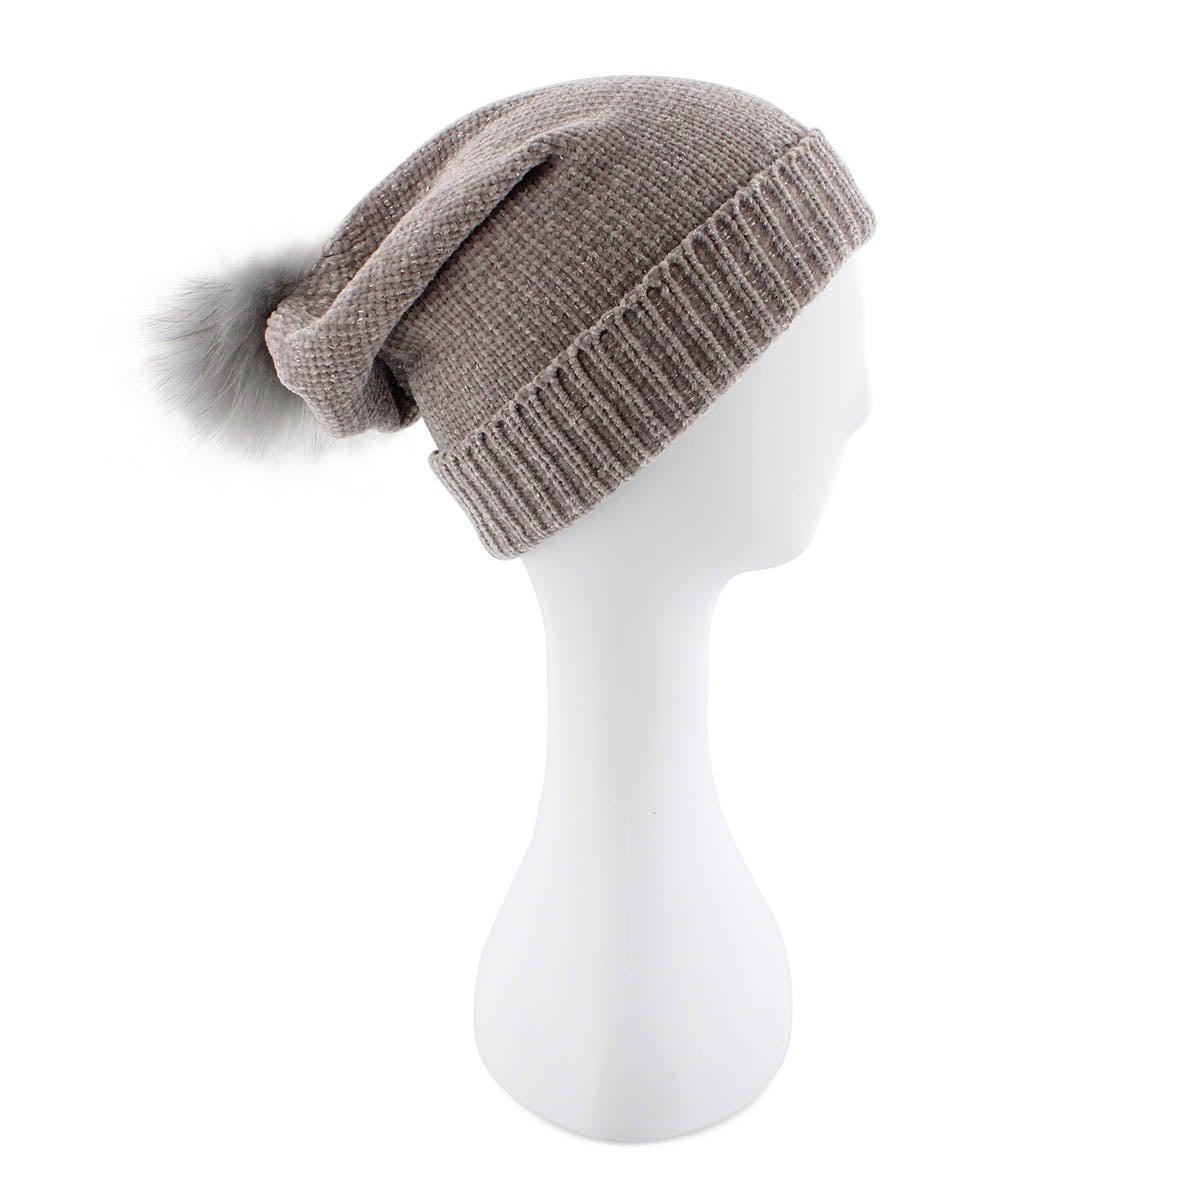 Lds Chenille Metallic Fur Pom lt gry hat